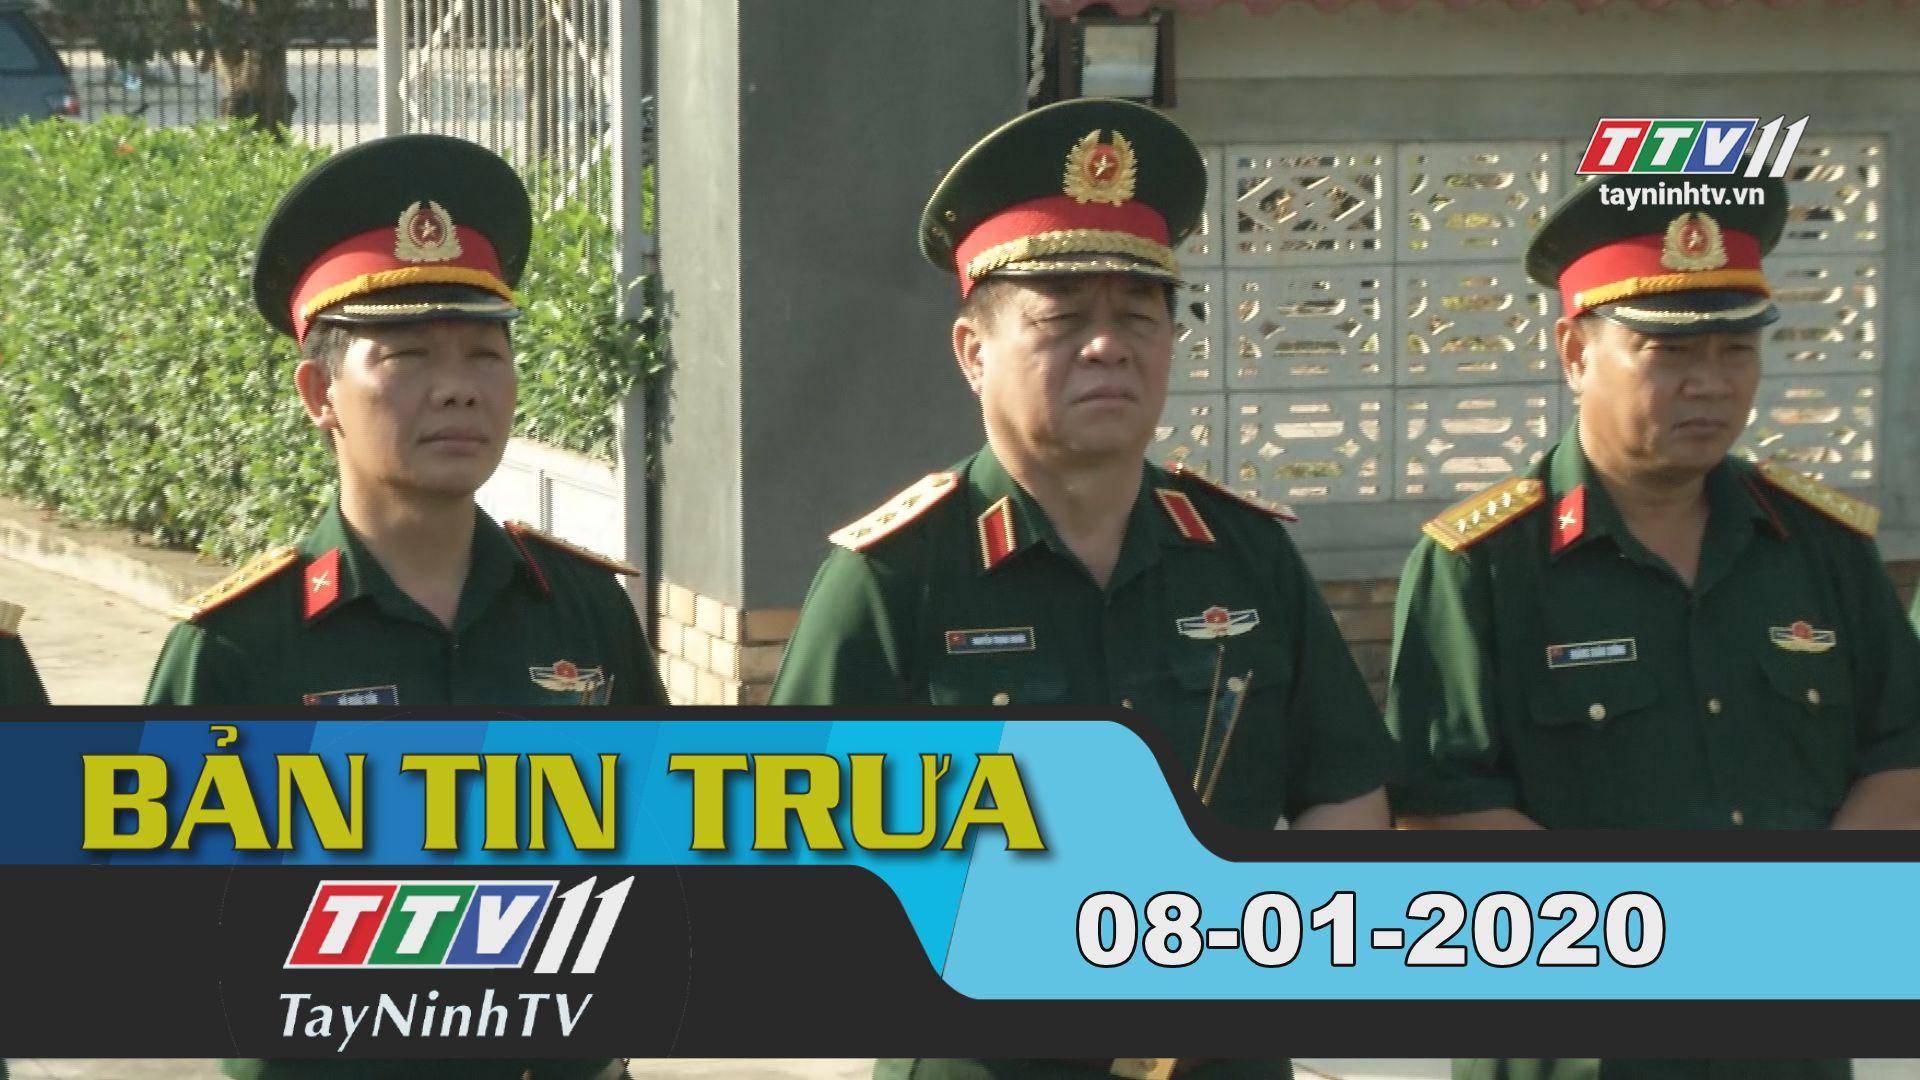 Bản tin trưa 08-01-2020 | Tin tức hôm nay | TayNinhTV